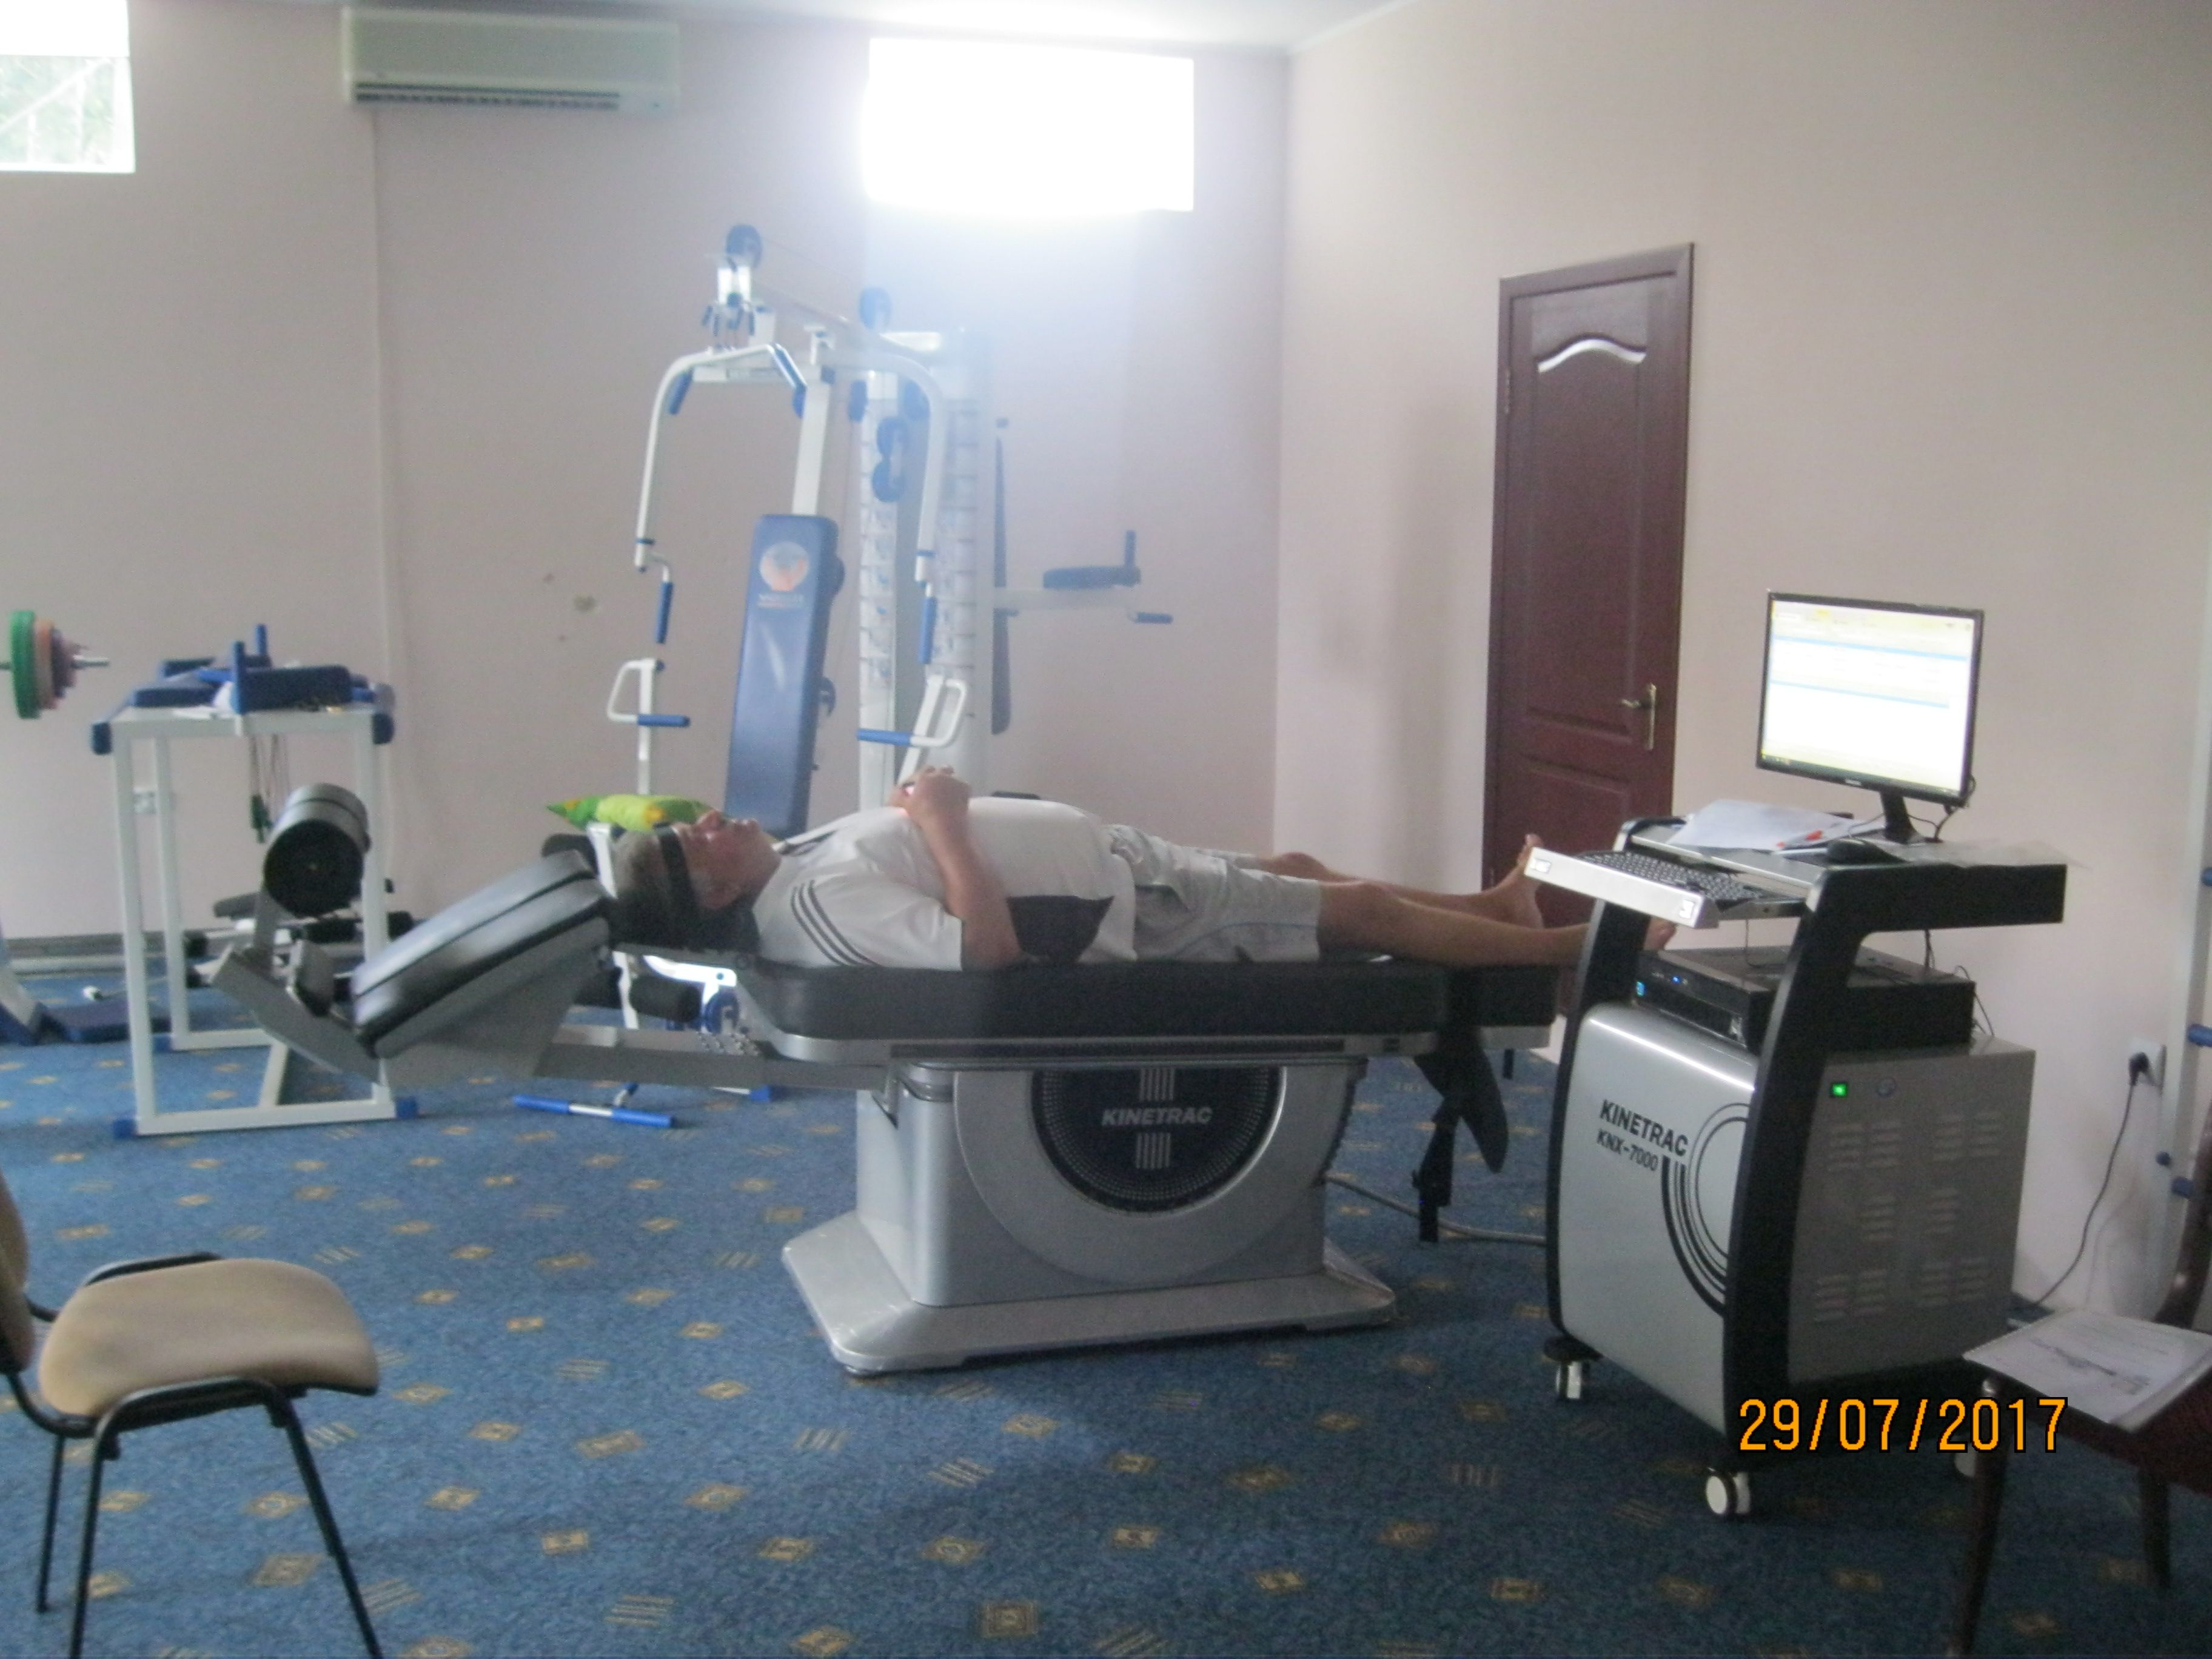 Лечение остеохондроза в Крыму в Феодосии в пансионате Украина 1